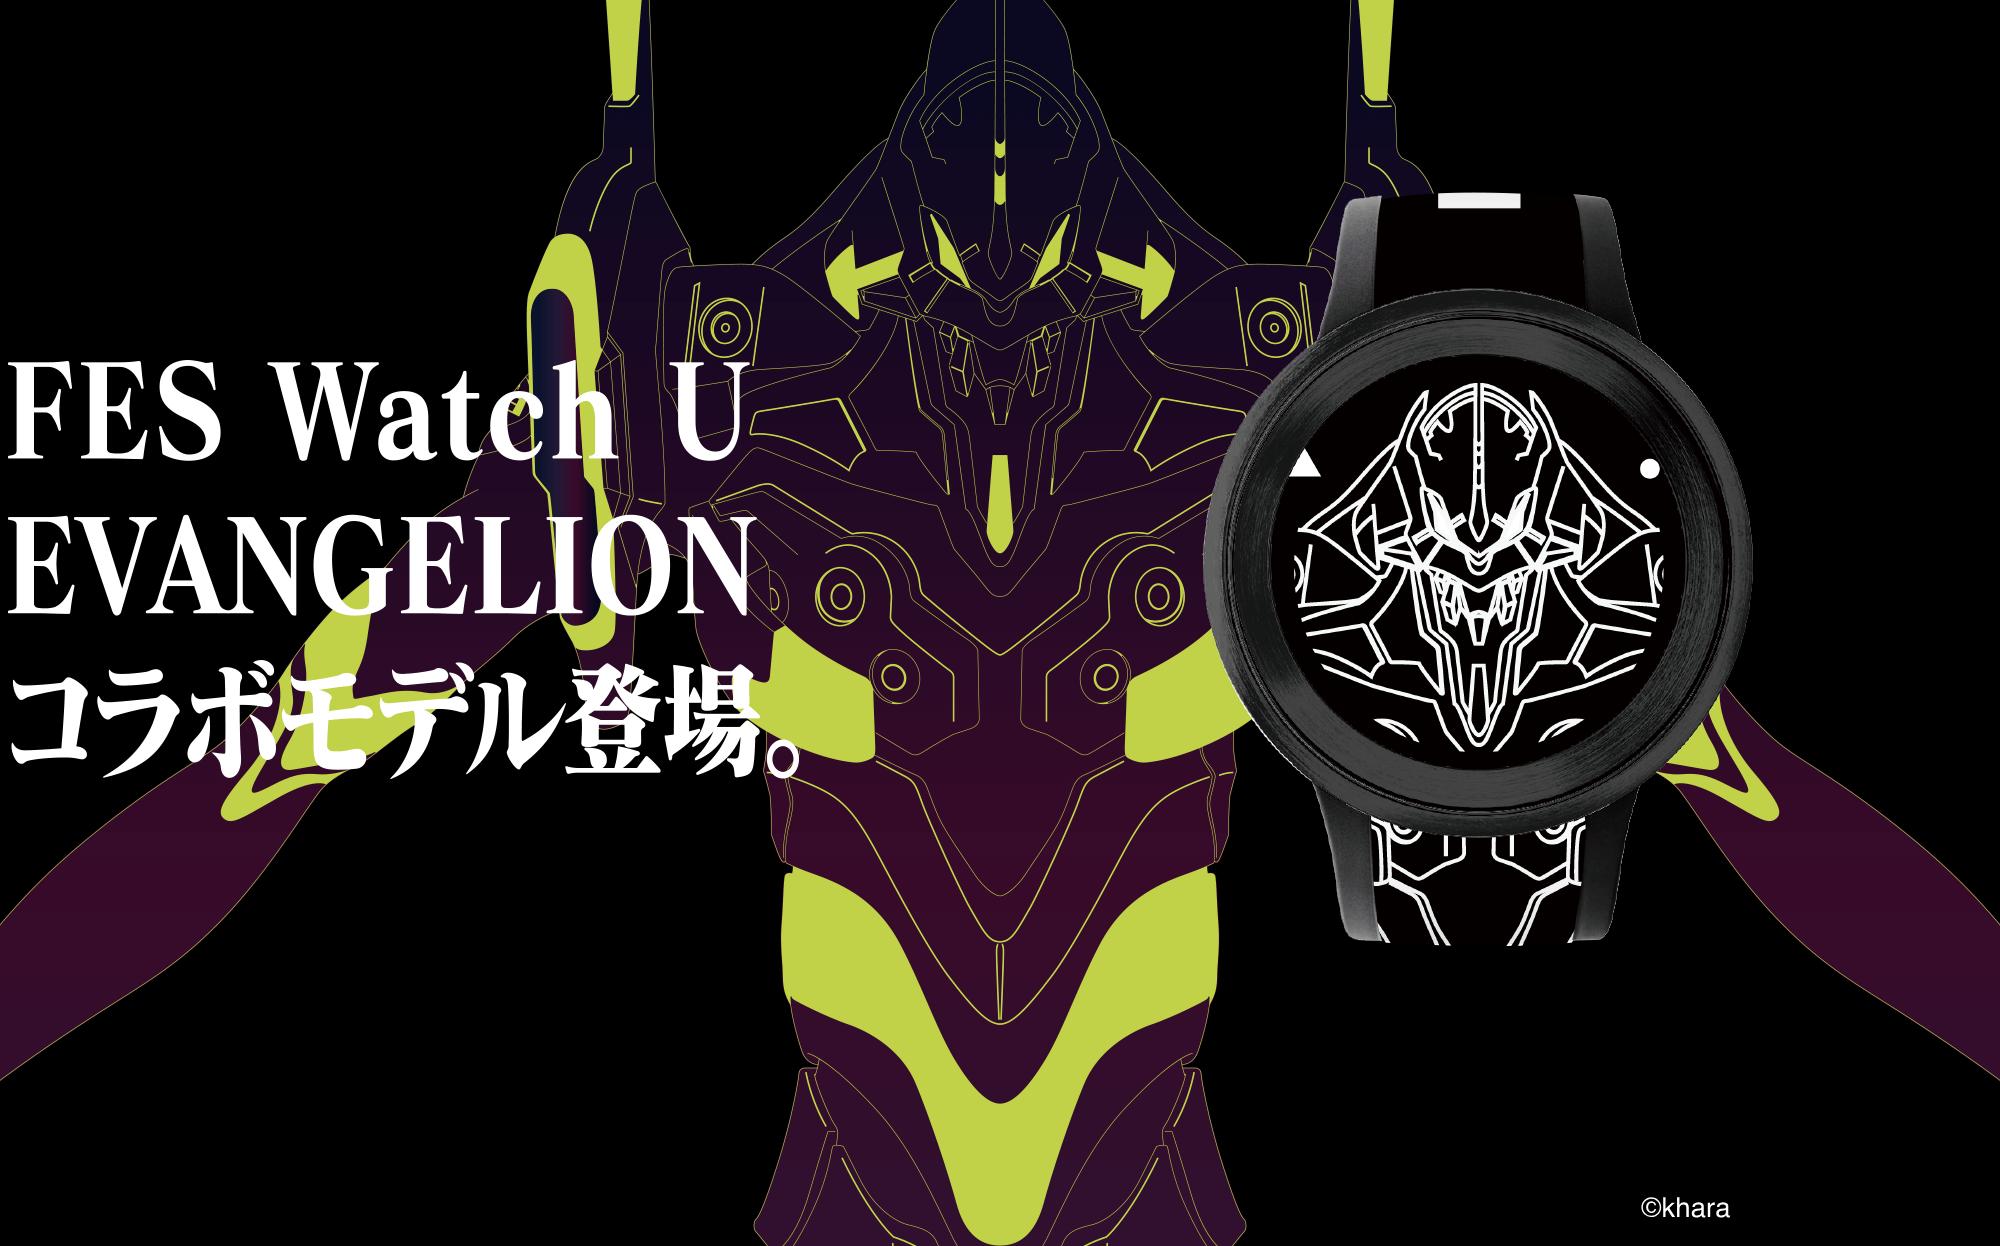 EVANGELION(エヴァンゲリオン)FES Watch U 限定モデル登場